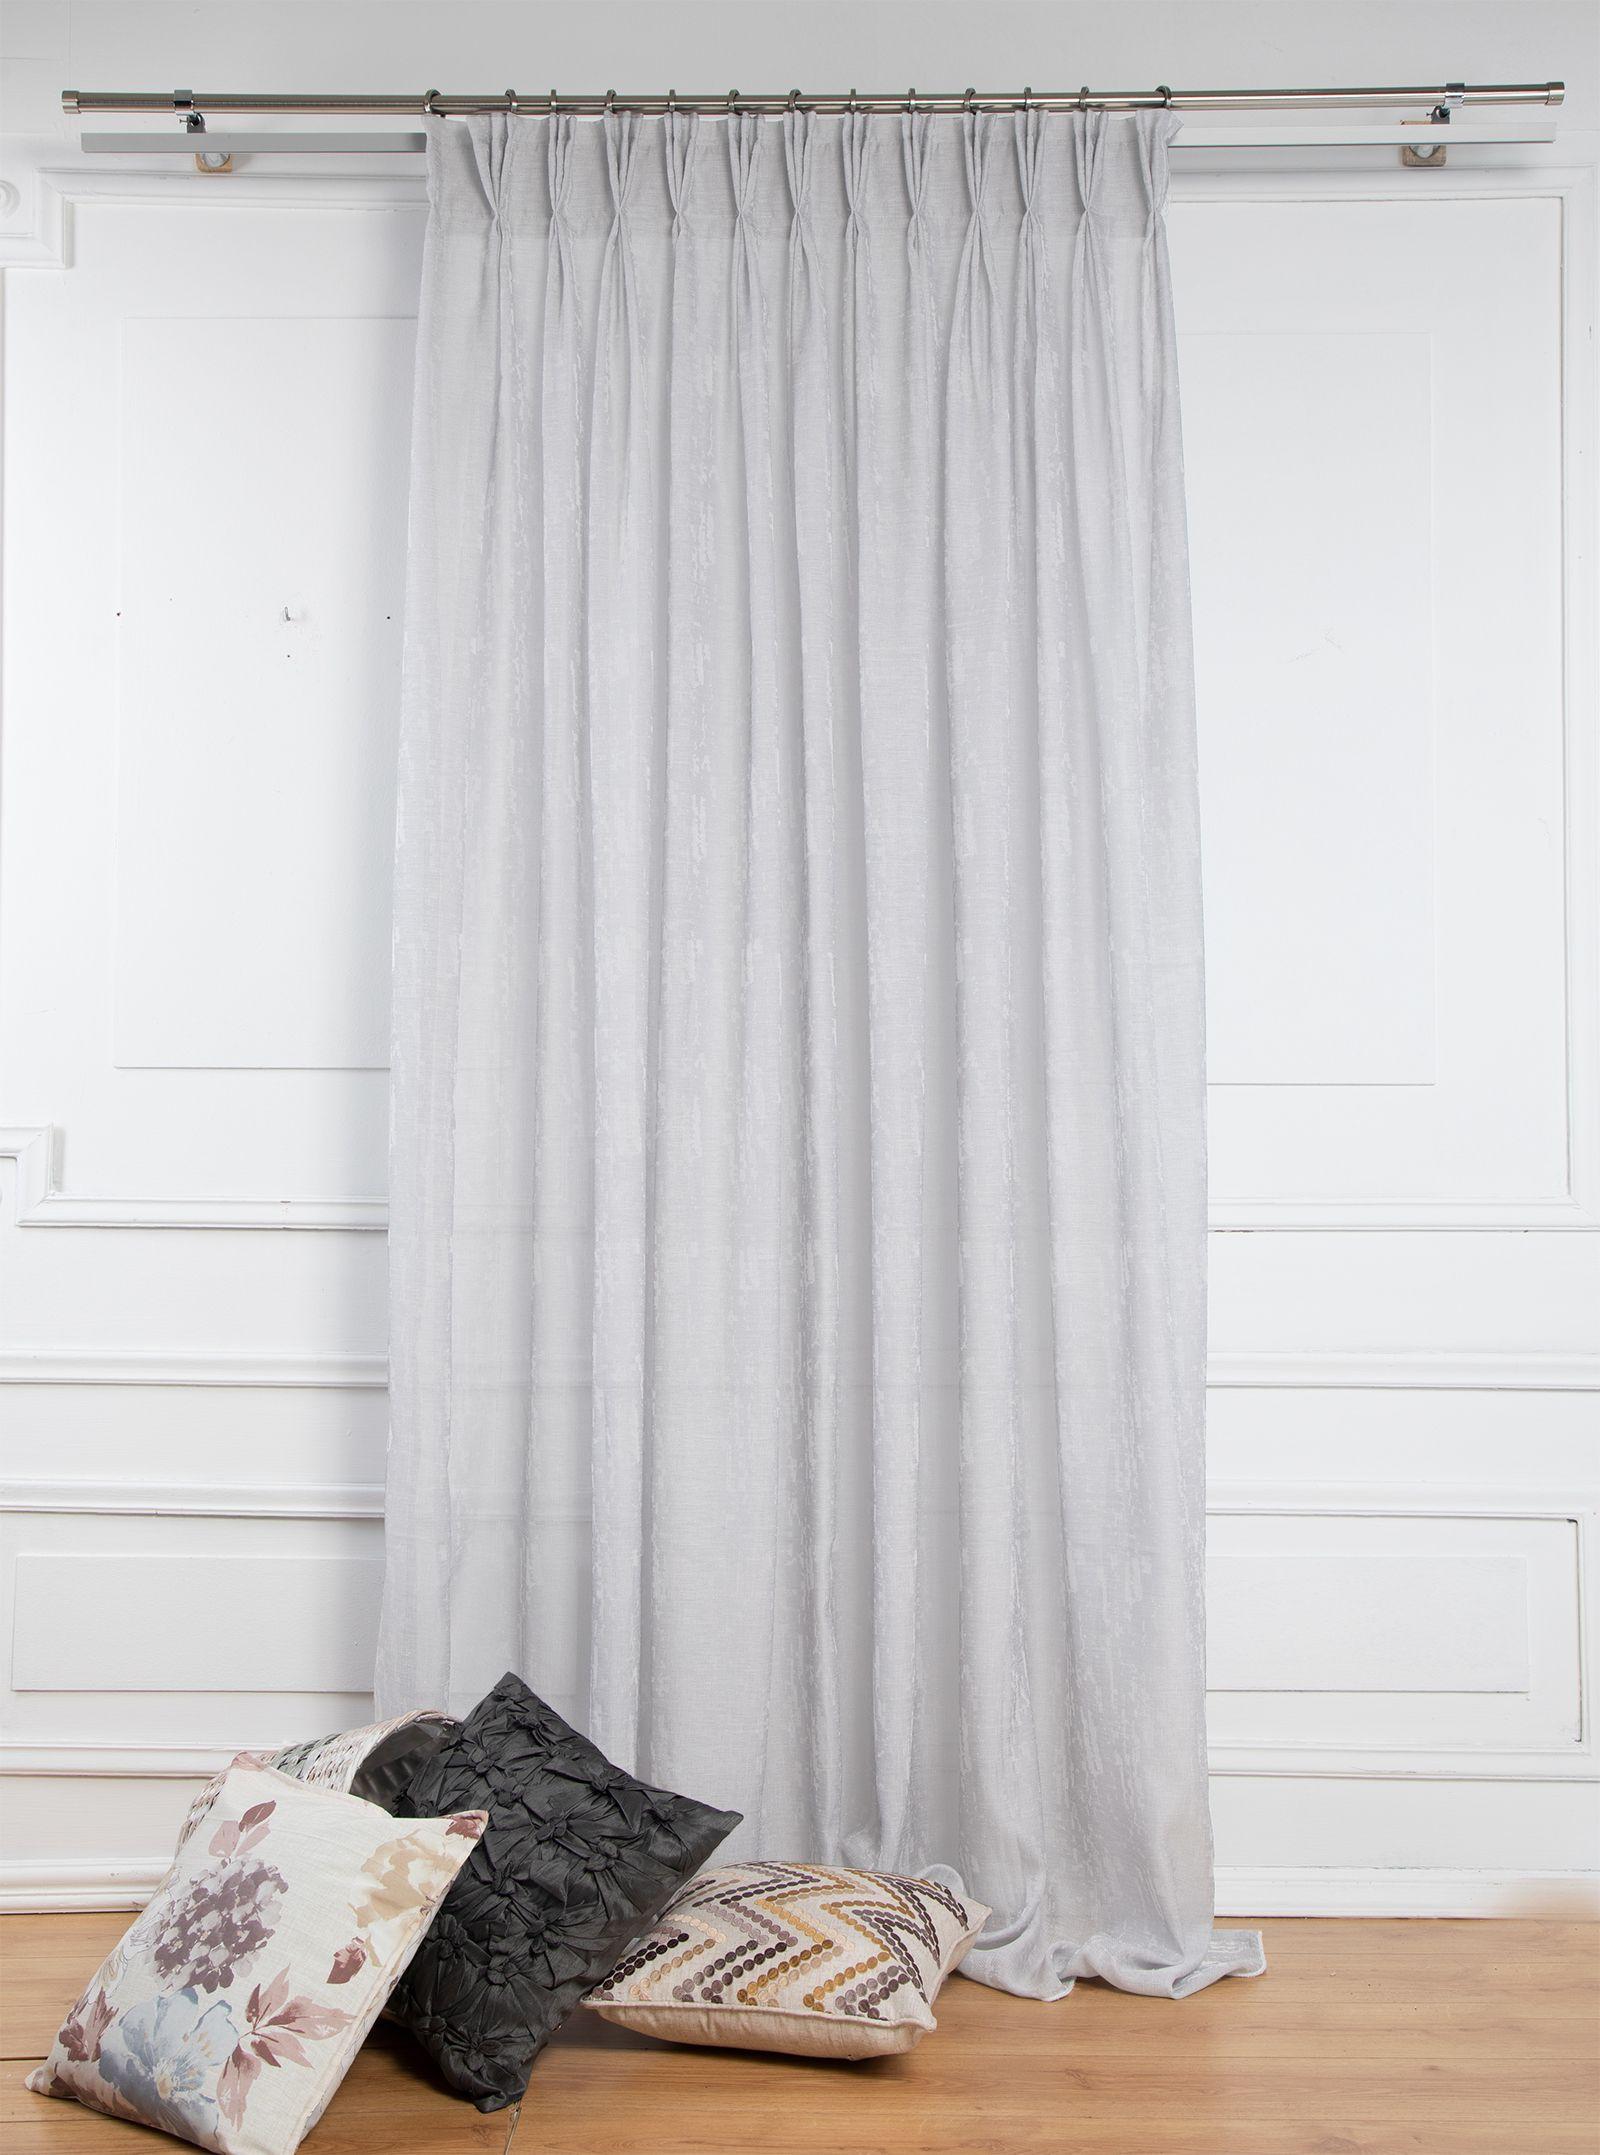 Semi Sheer Jacquard Pattern Pinch Pleat Curtains Pinch Pleat Curtains Pinch Pleat Pleated Curtains